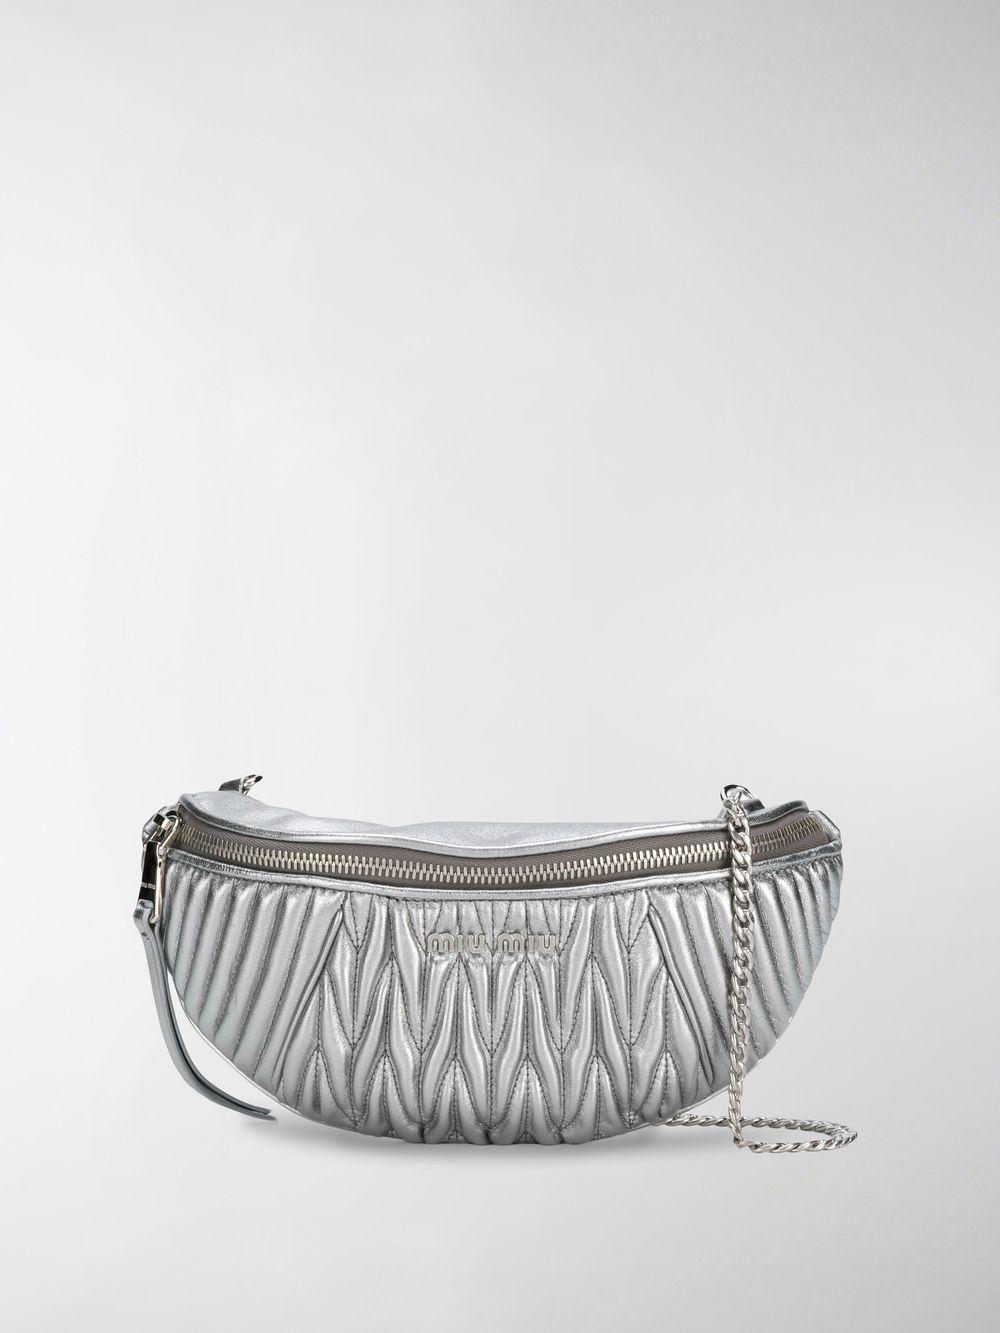 ad341bb6b0d Miu Miu Matelassé Belt Bag in Metallic - Lyst